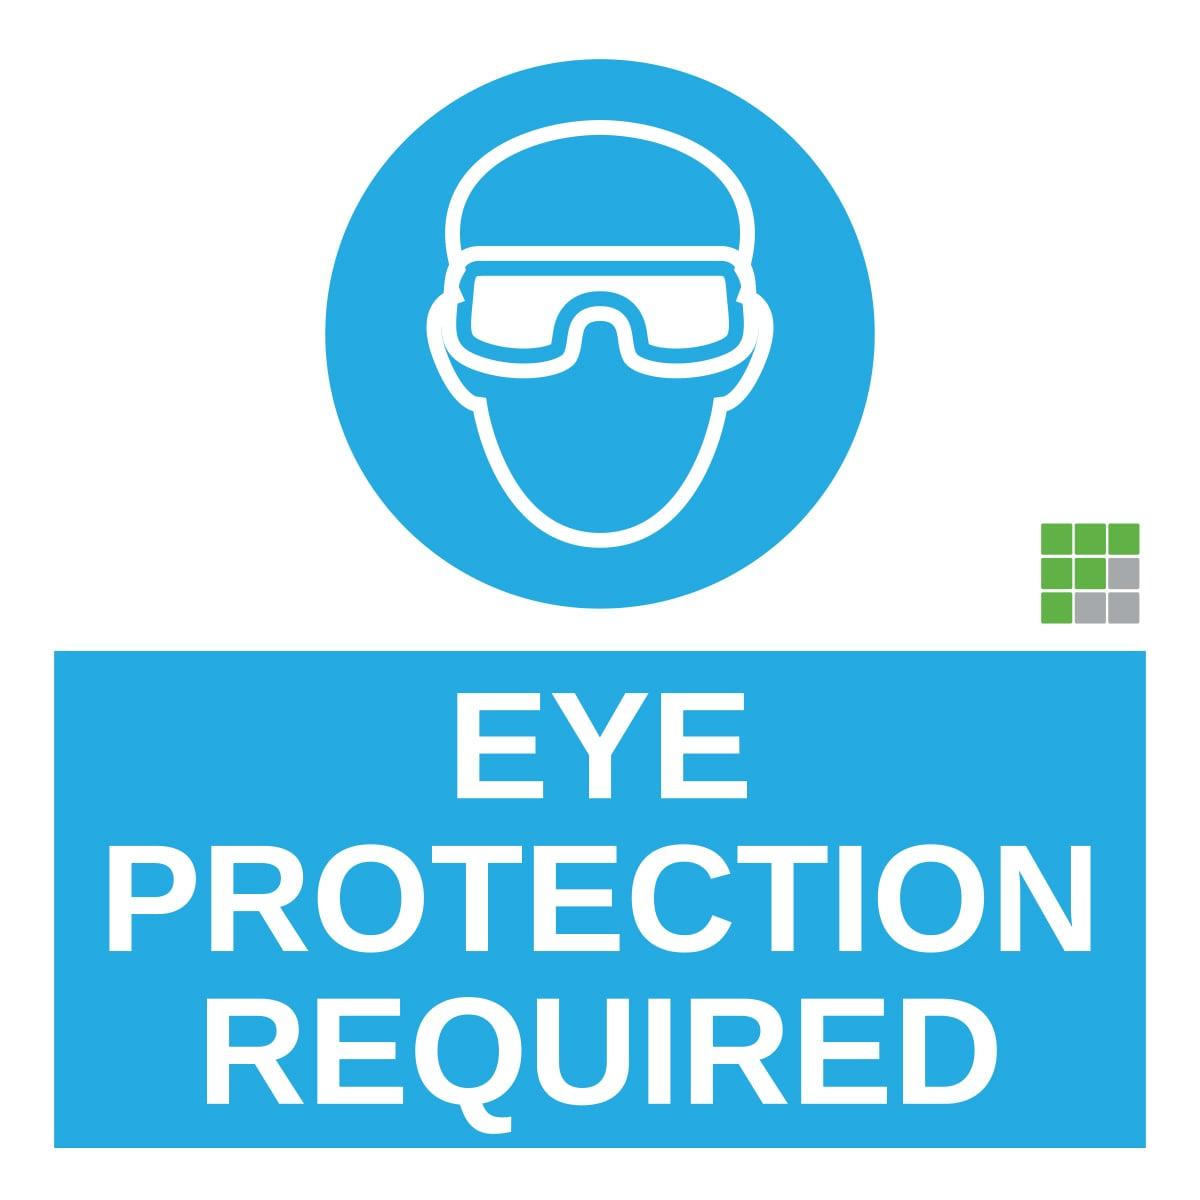 eye protection - 1x1ft.jpg